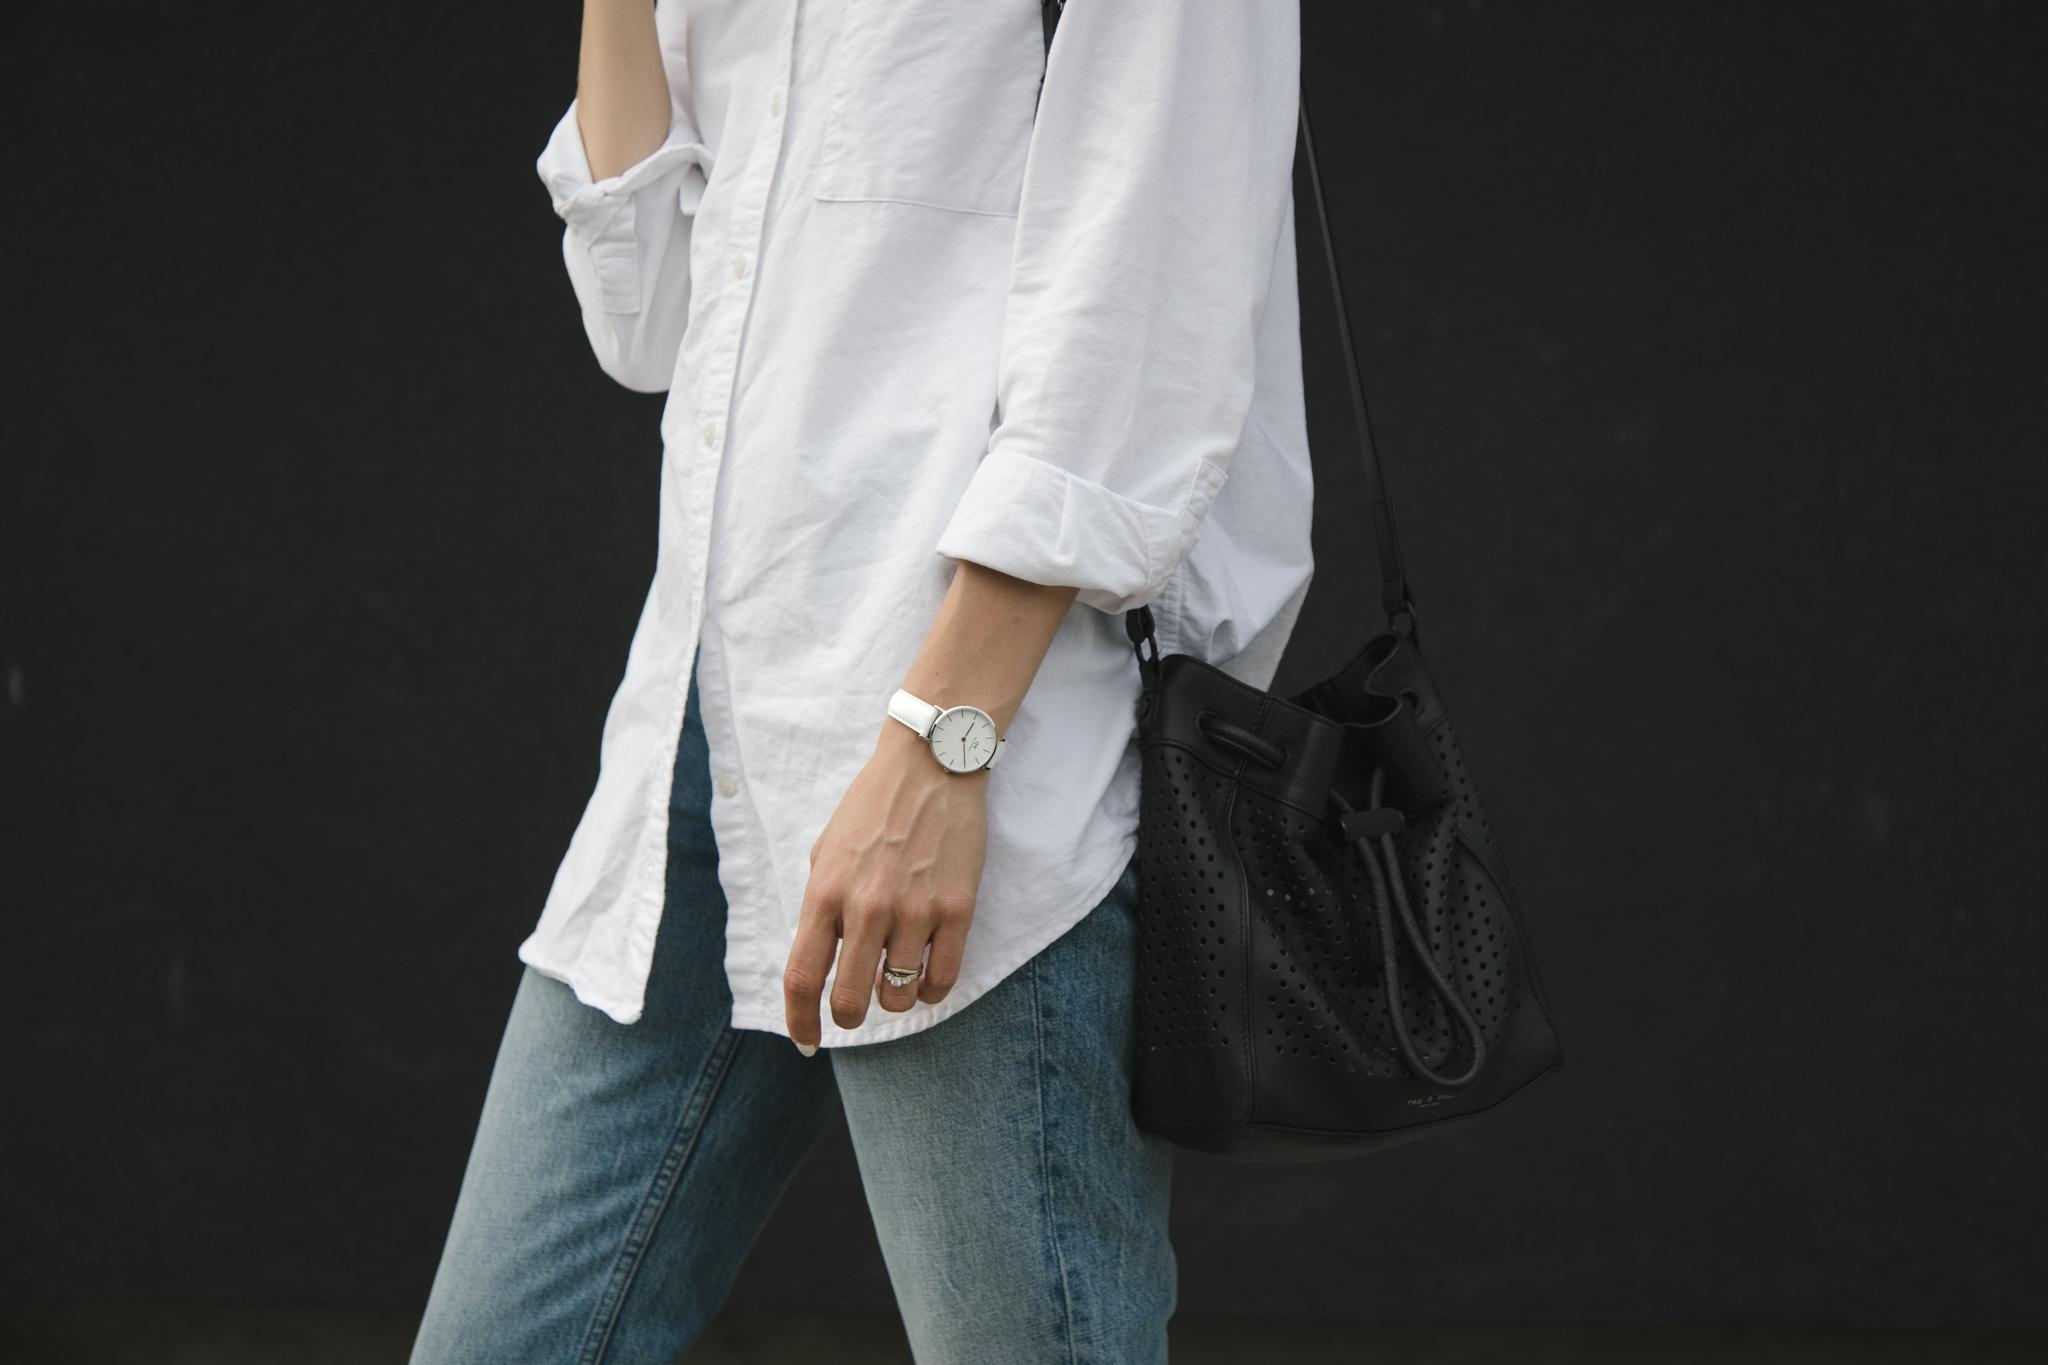 sharday-engel-frank-oak-shirt-fifth-sunglasses-helmut-lang-jeans5997.jpg